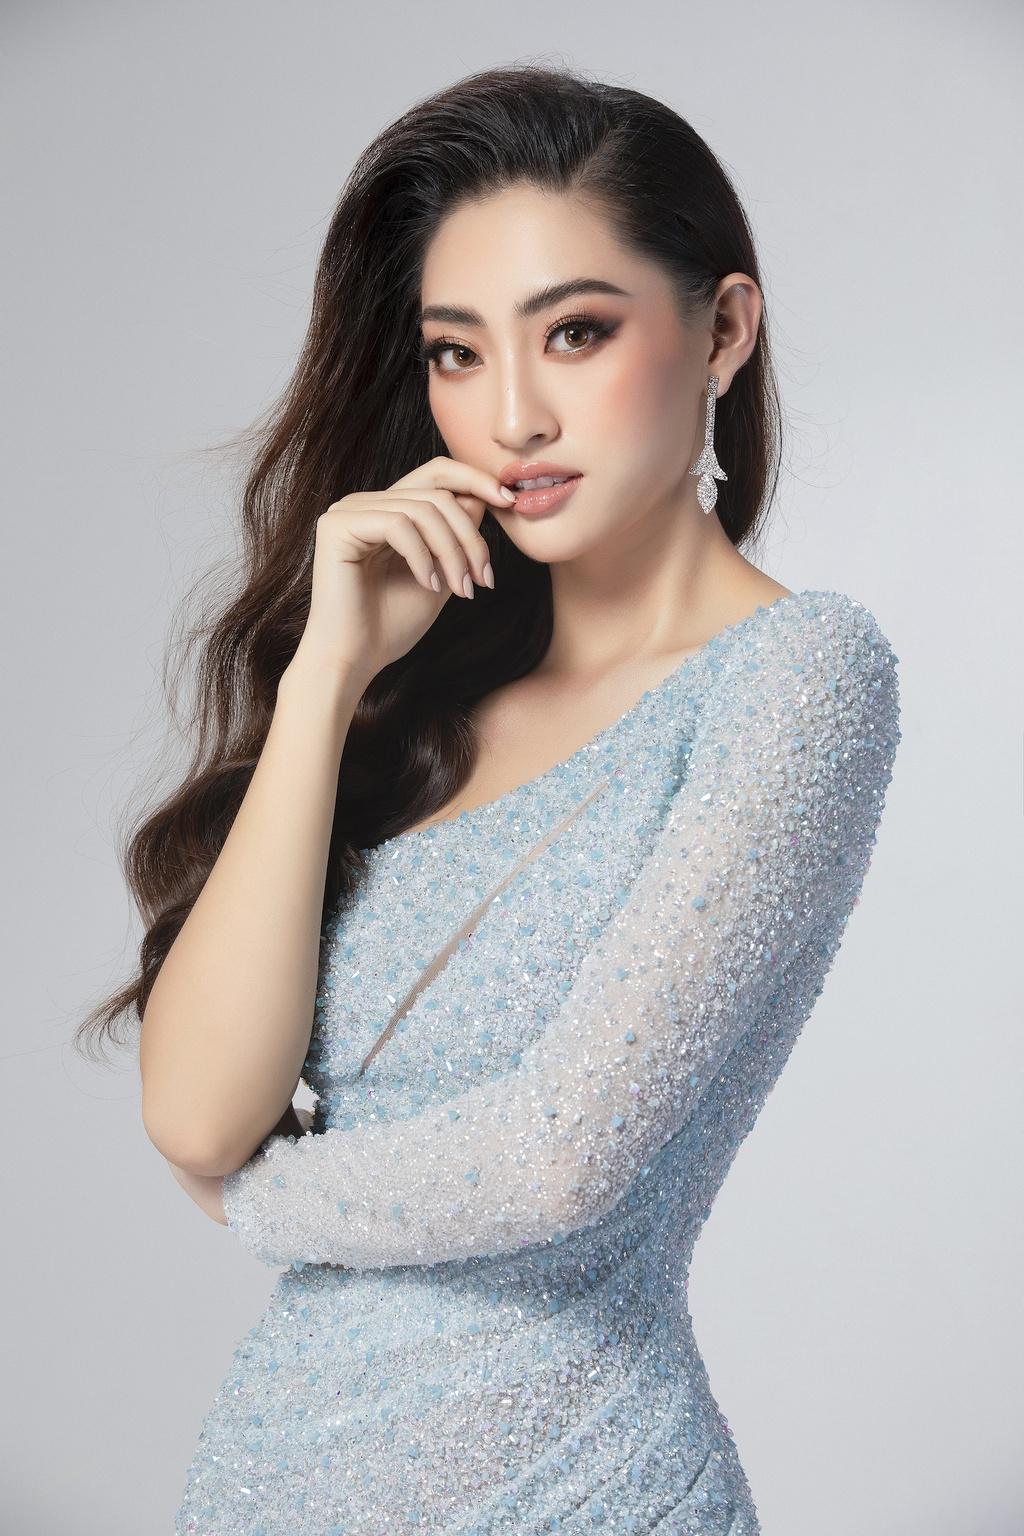 Luong Thuy Linh mac vay xe cao khoe chan 1,22 m o chung ket Miss World hinh anh 2 null